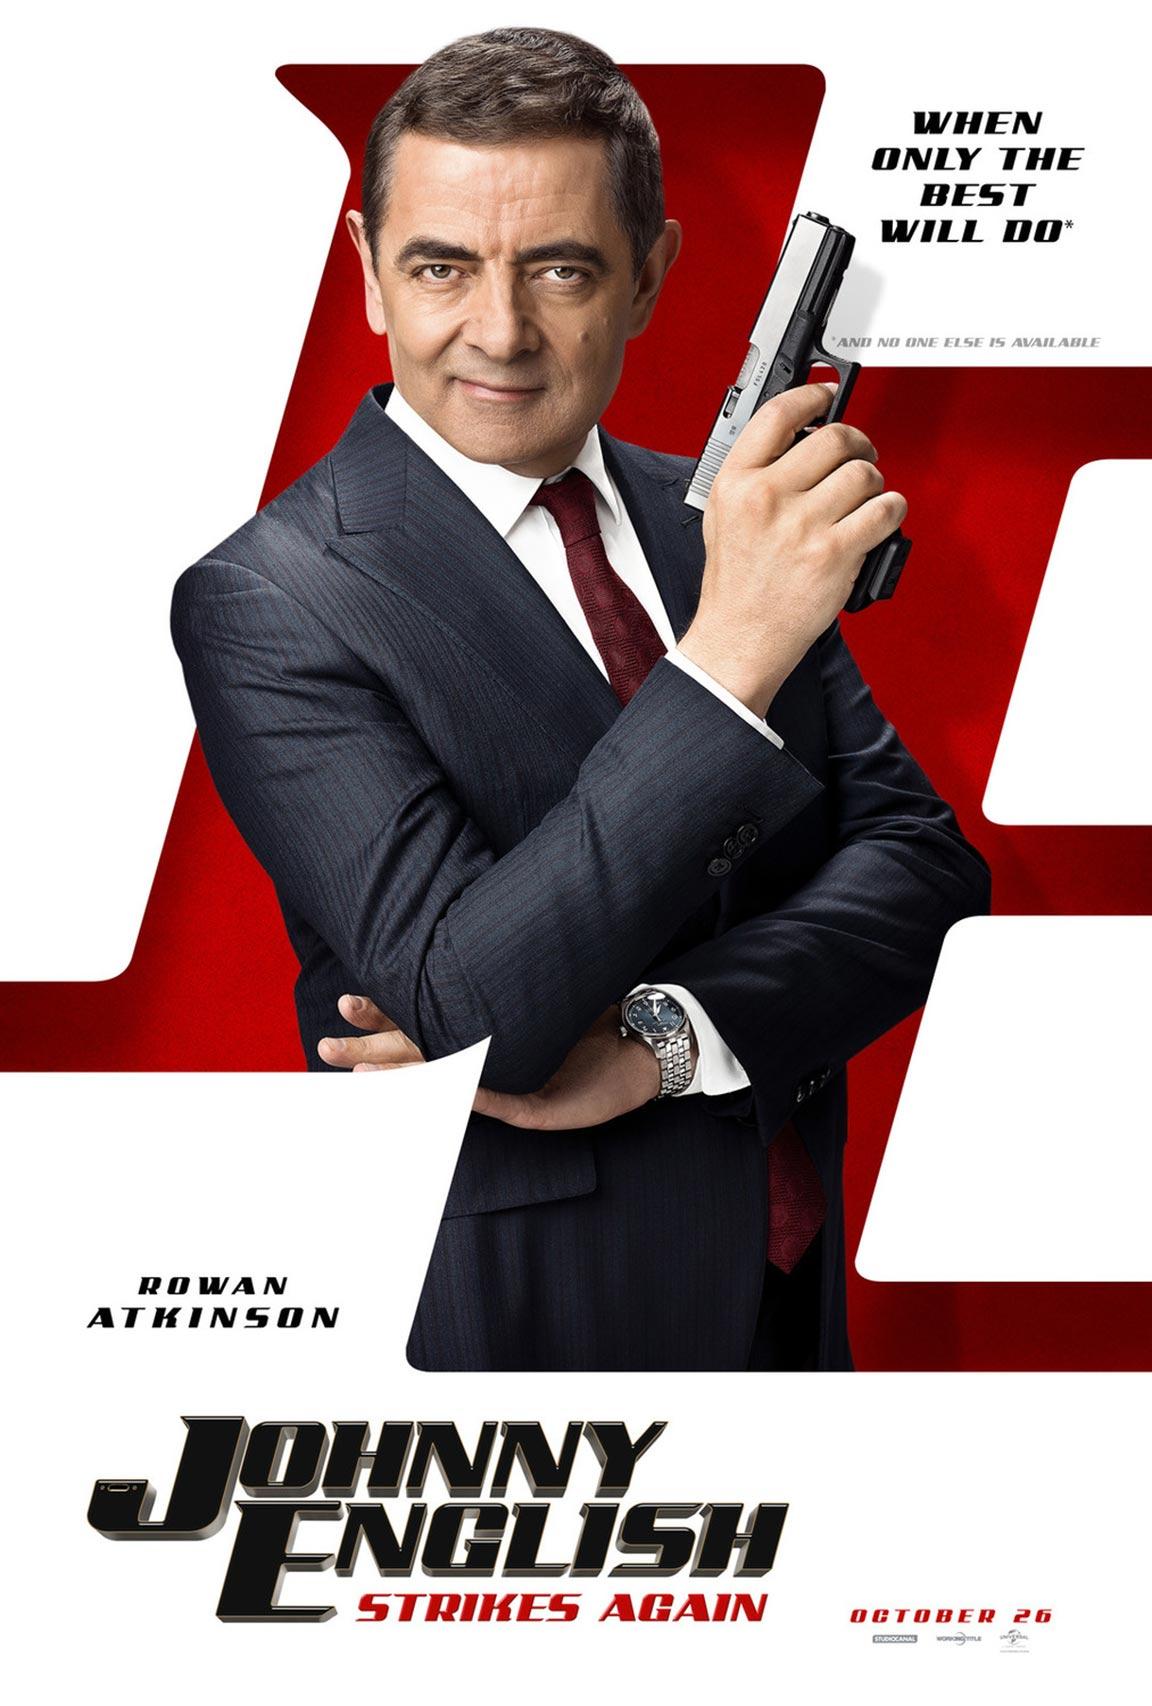 Alita Battle Angel >> Johnny English Strikes Again (2018) Poster #1 - Trailer Addict